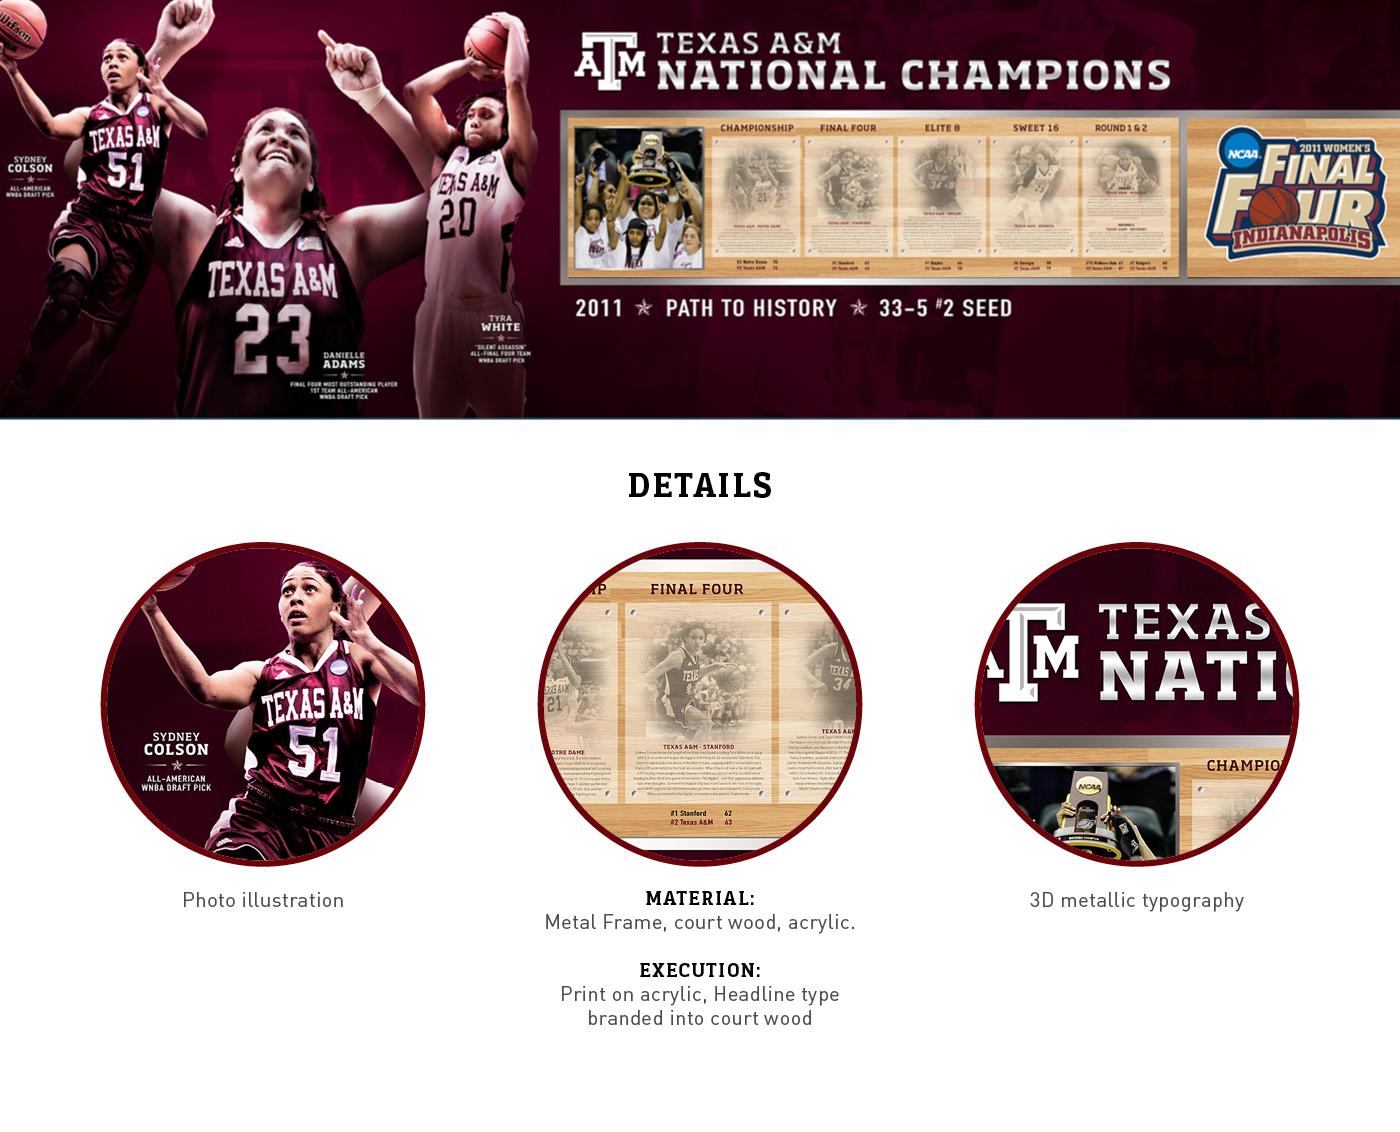 Mark Migliorelli - Texas A&M Women's Basketball Facilities